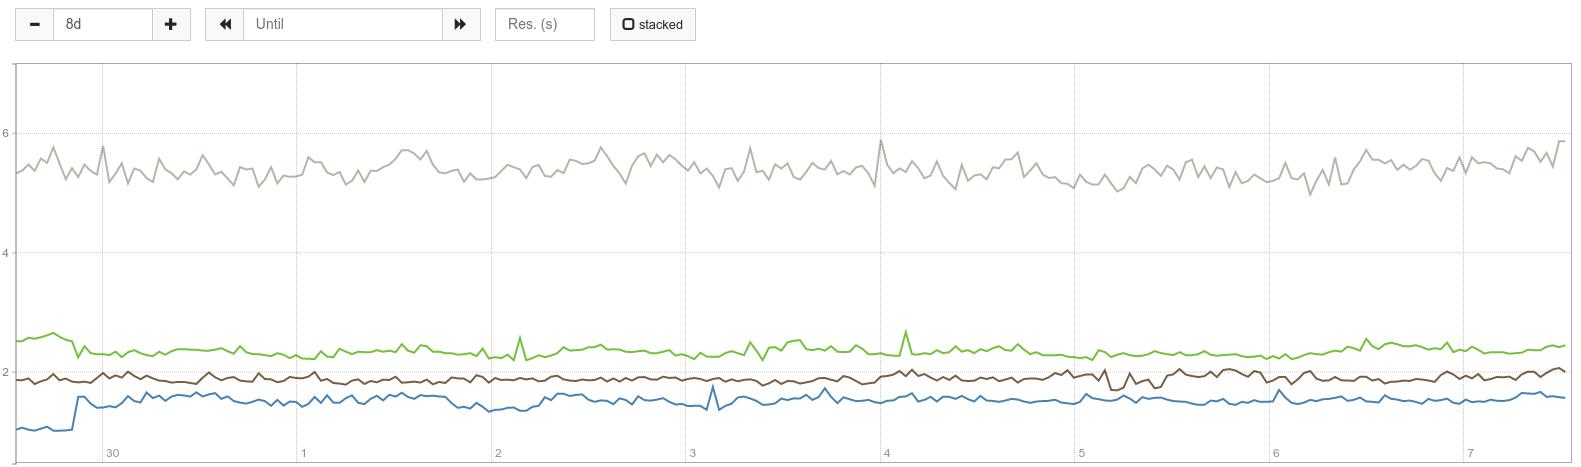 AWS ElastiCache CPU utilization (average)